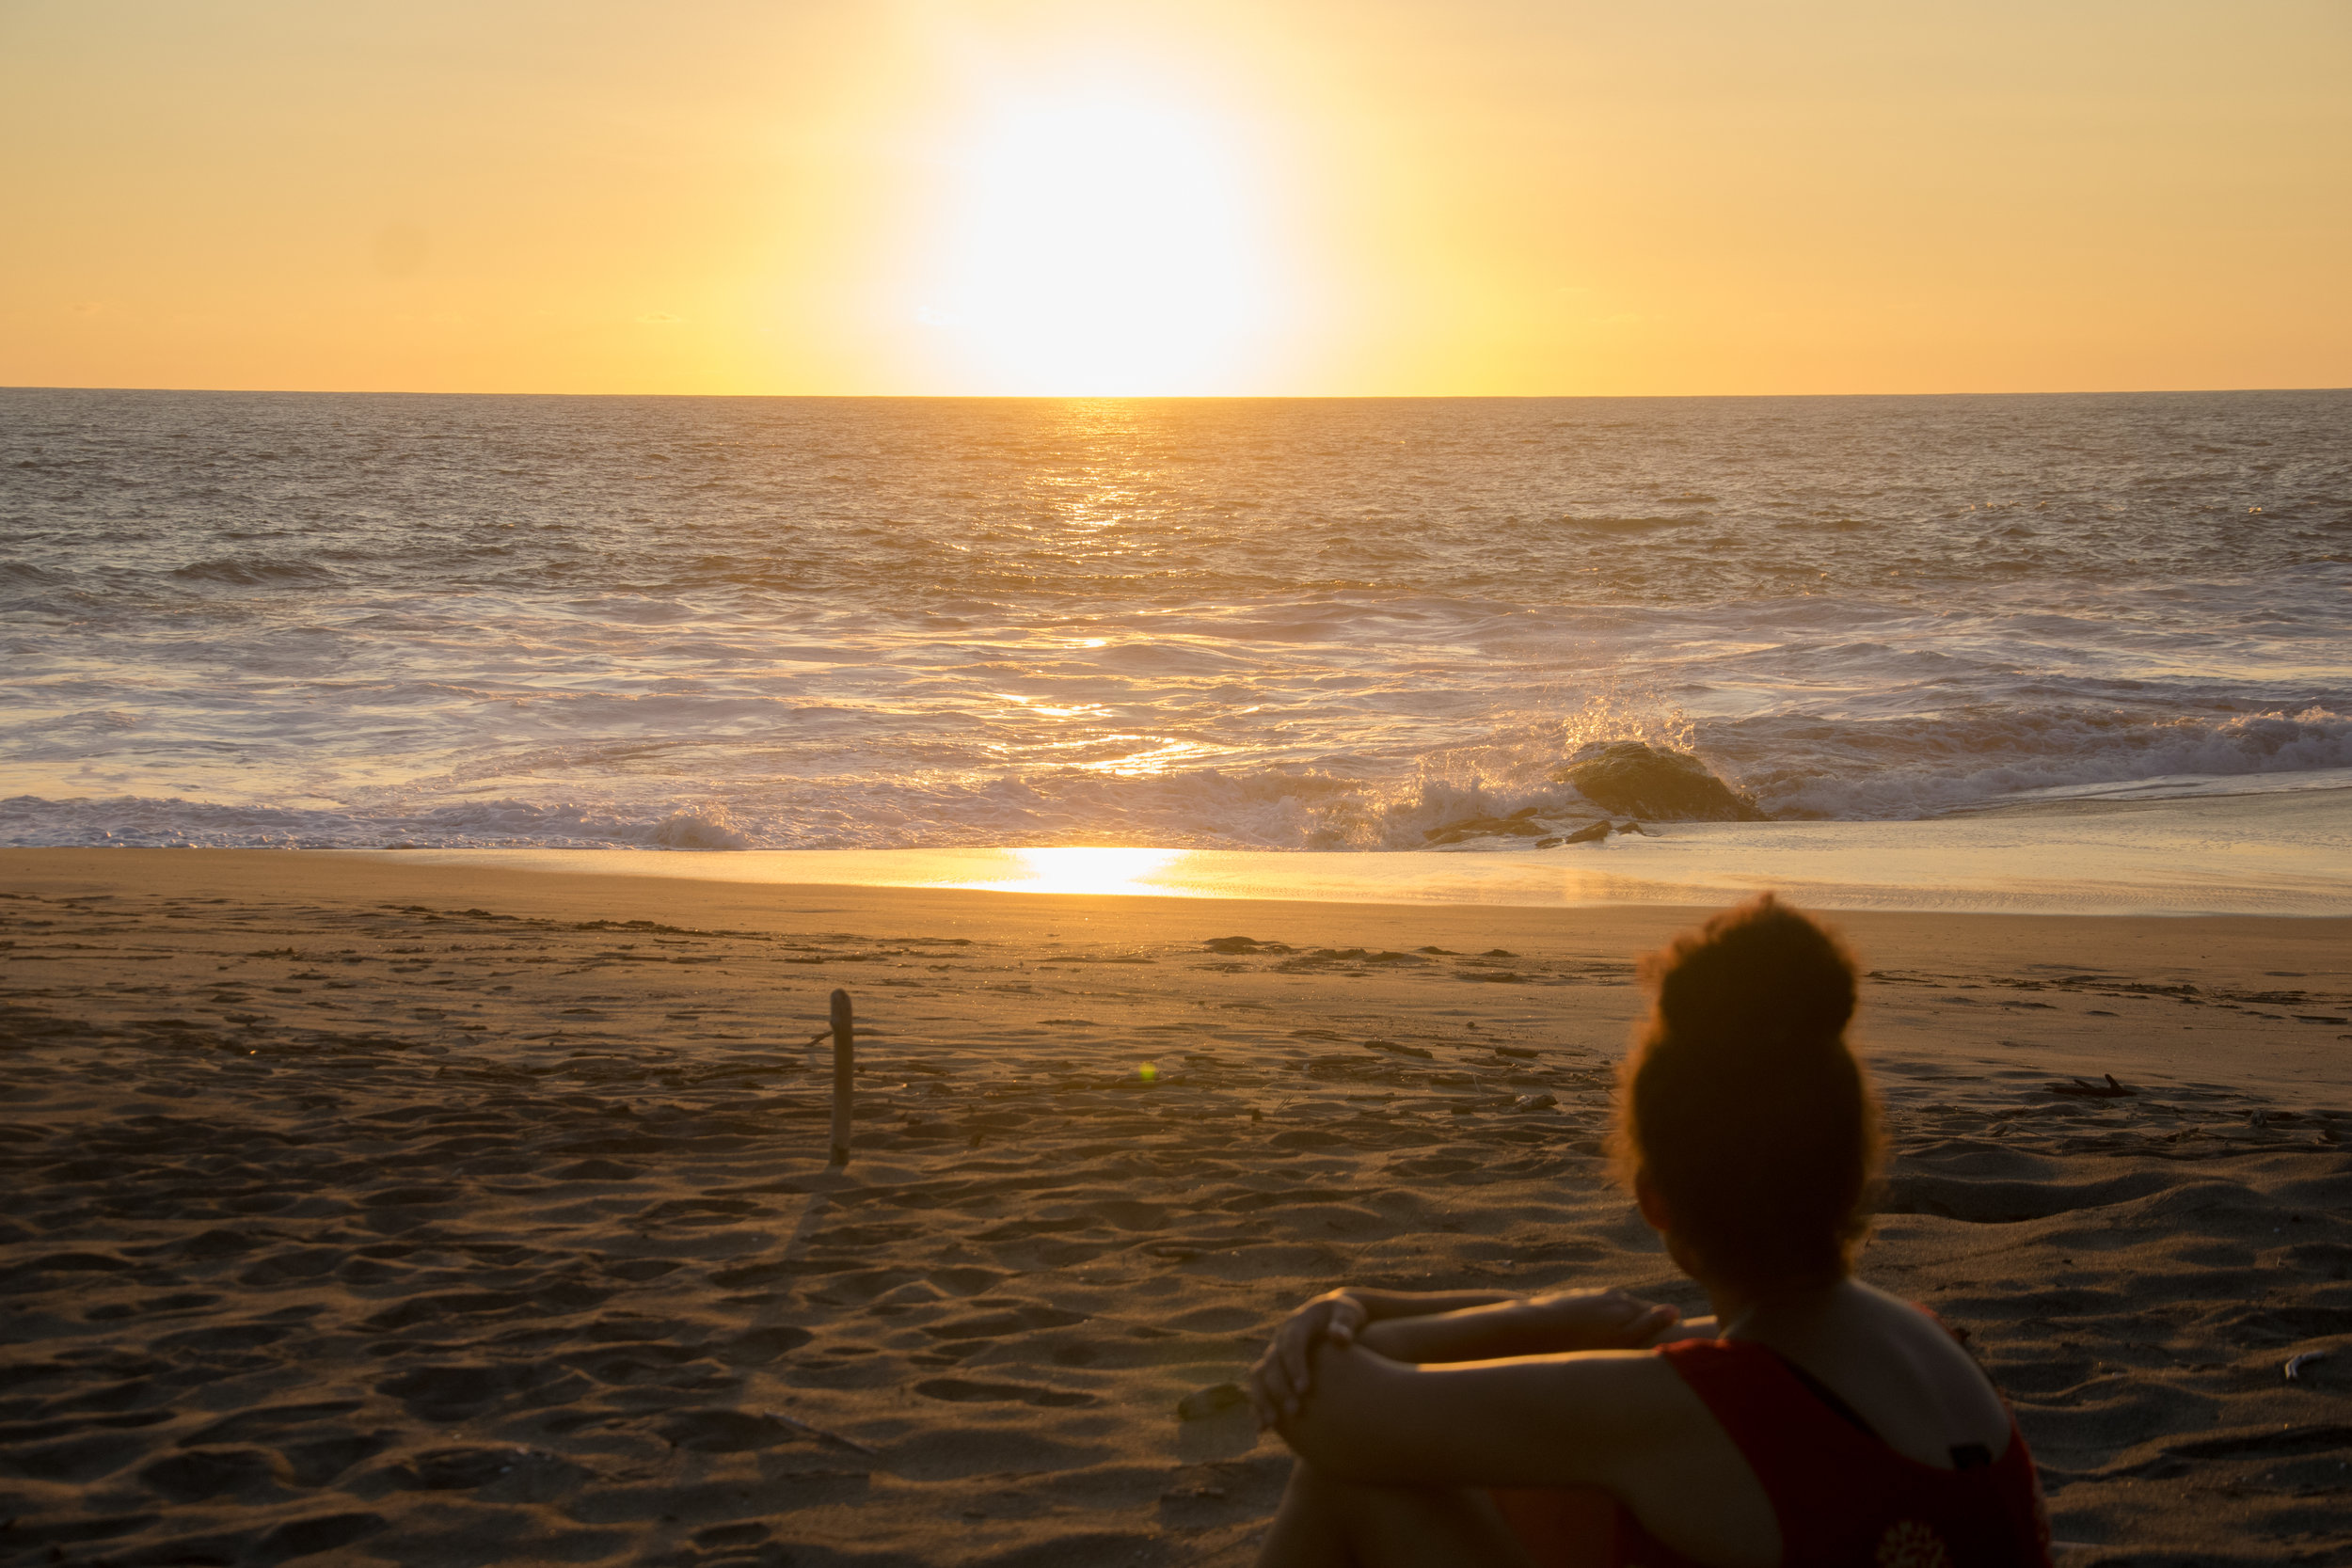 sunset_puntacometa_oaxaca_mazunte.jpg